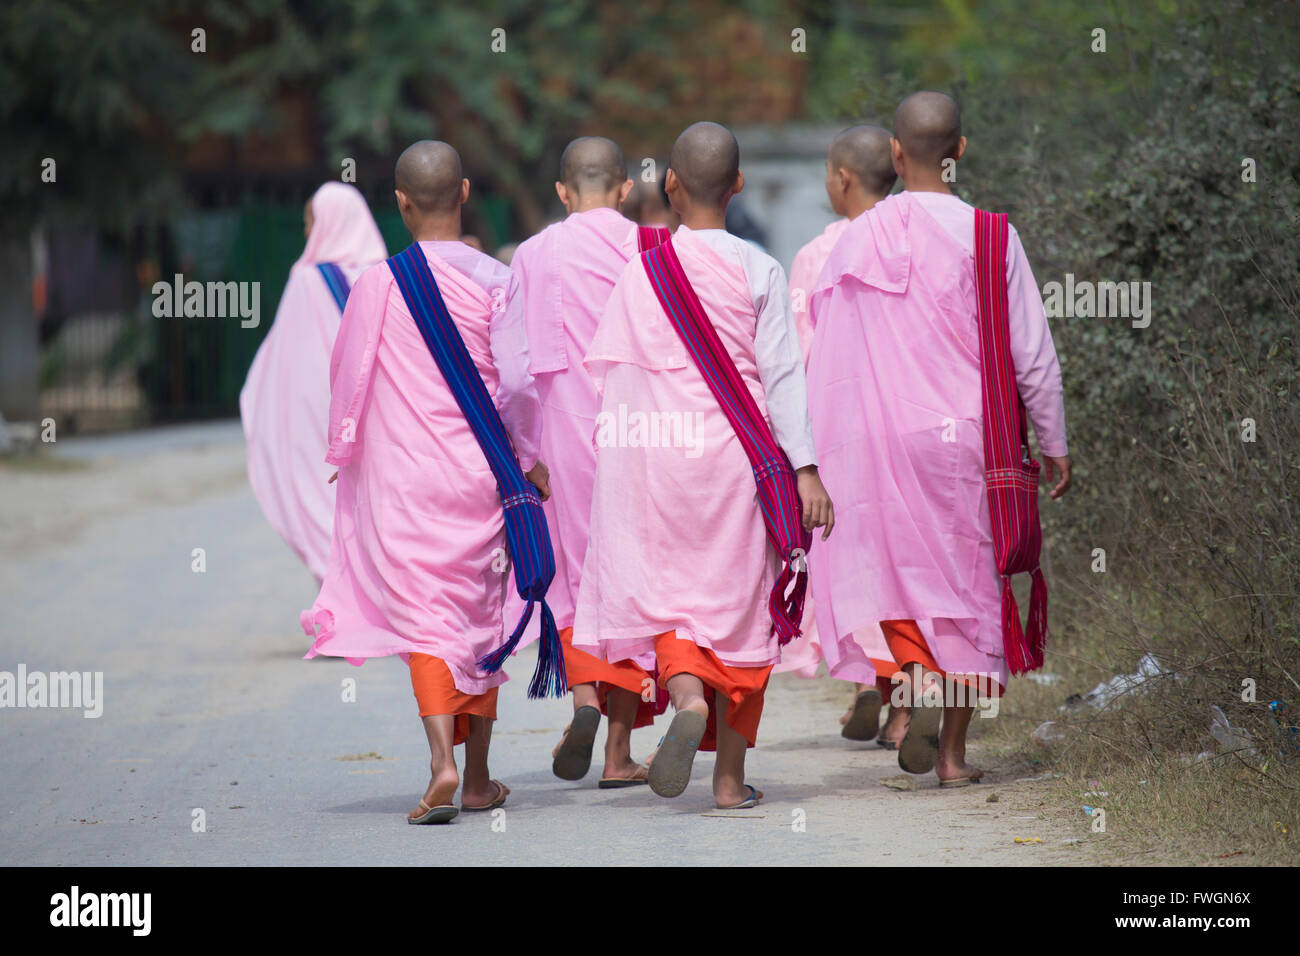 Buddhist nuns in traditional robes, Sagaing, Myanmar (Burma), Southeast Asia - Stock Image